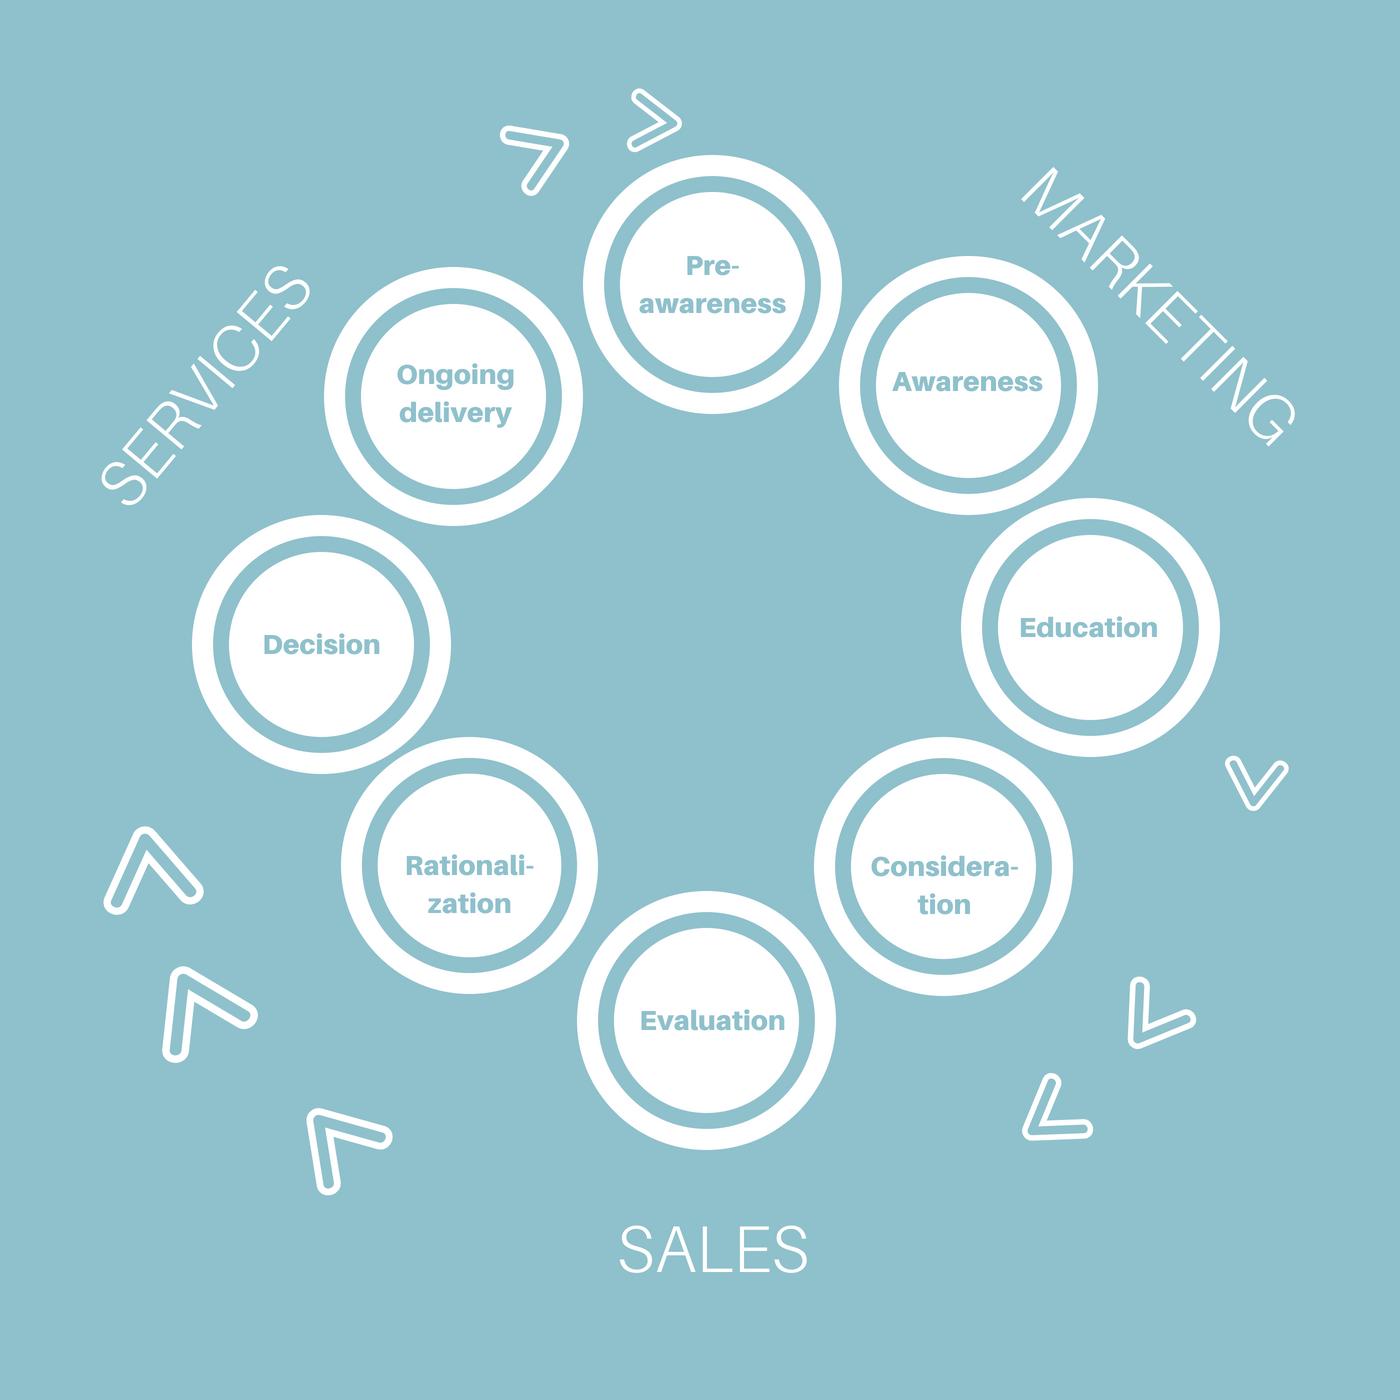 Den nye salgssyklusen (2) (1)